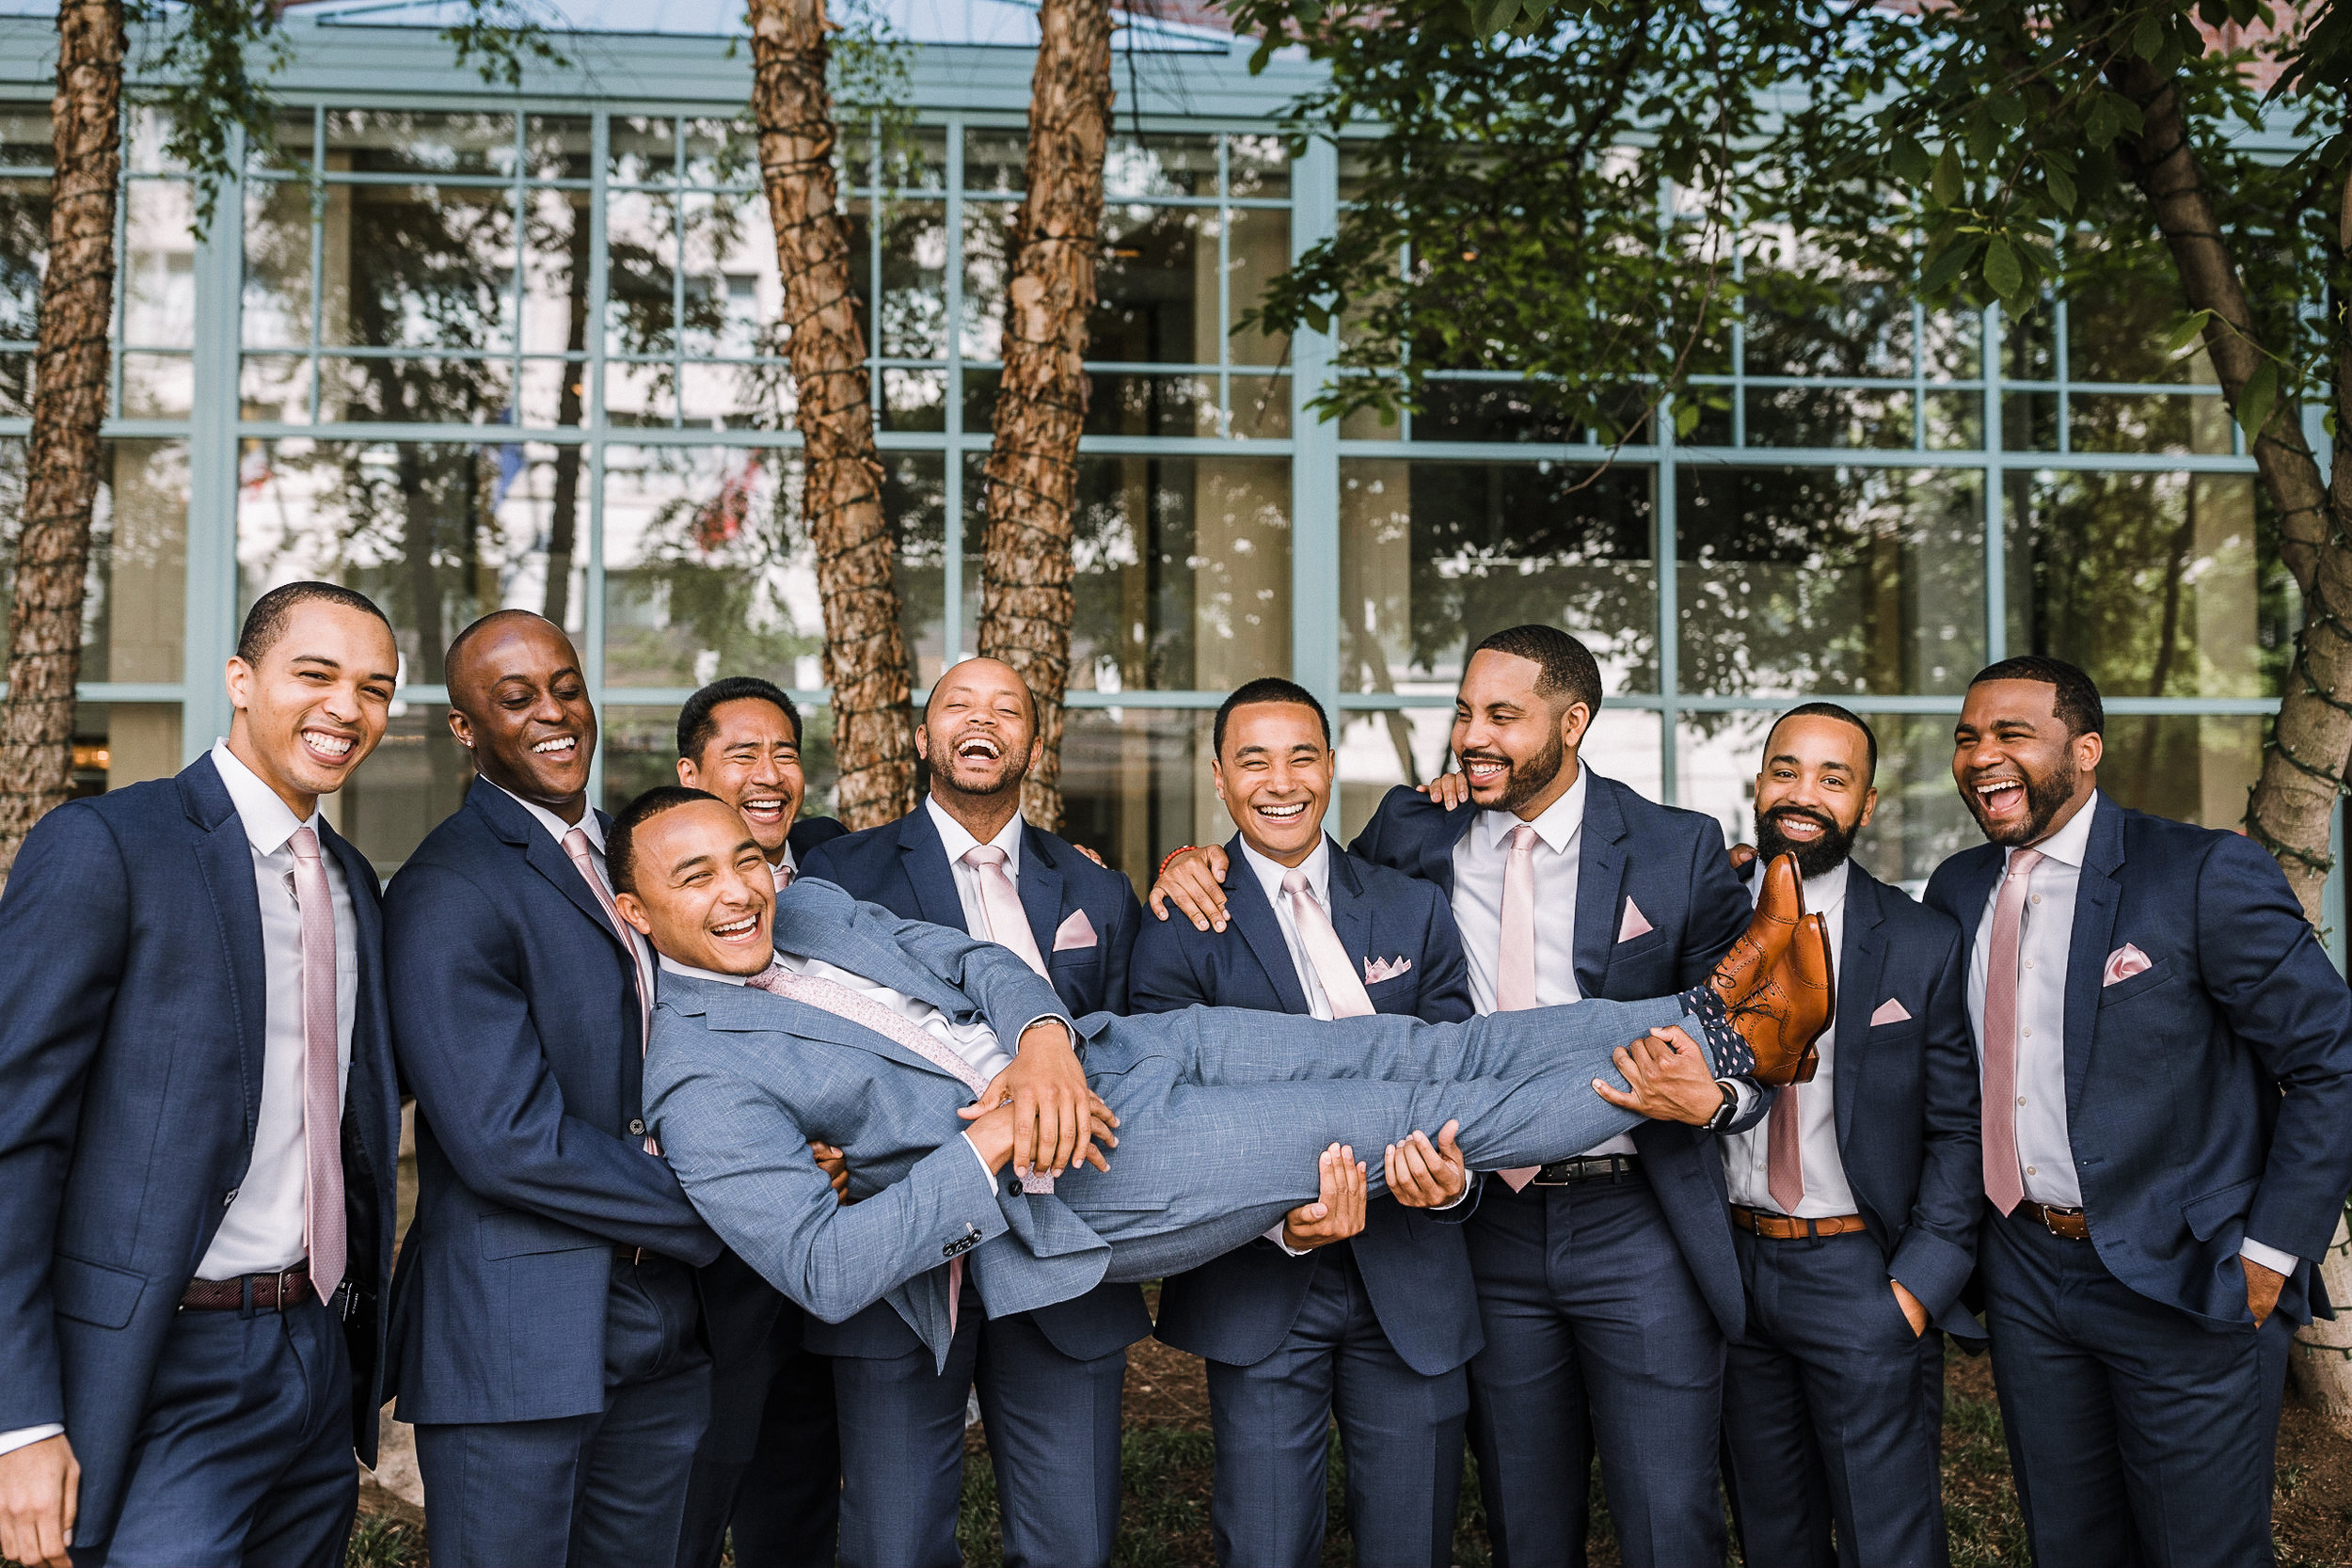 groom being carried by groomsmen at The Park Hyatt Hotel in Washington DC